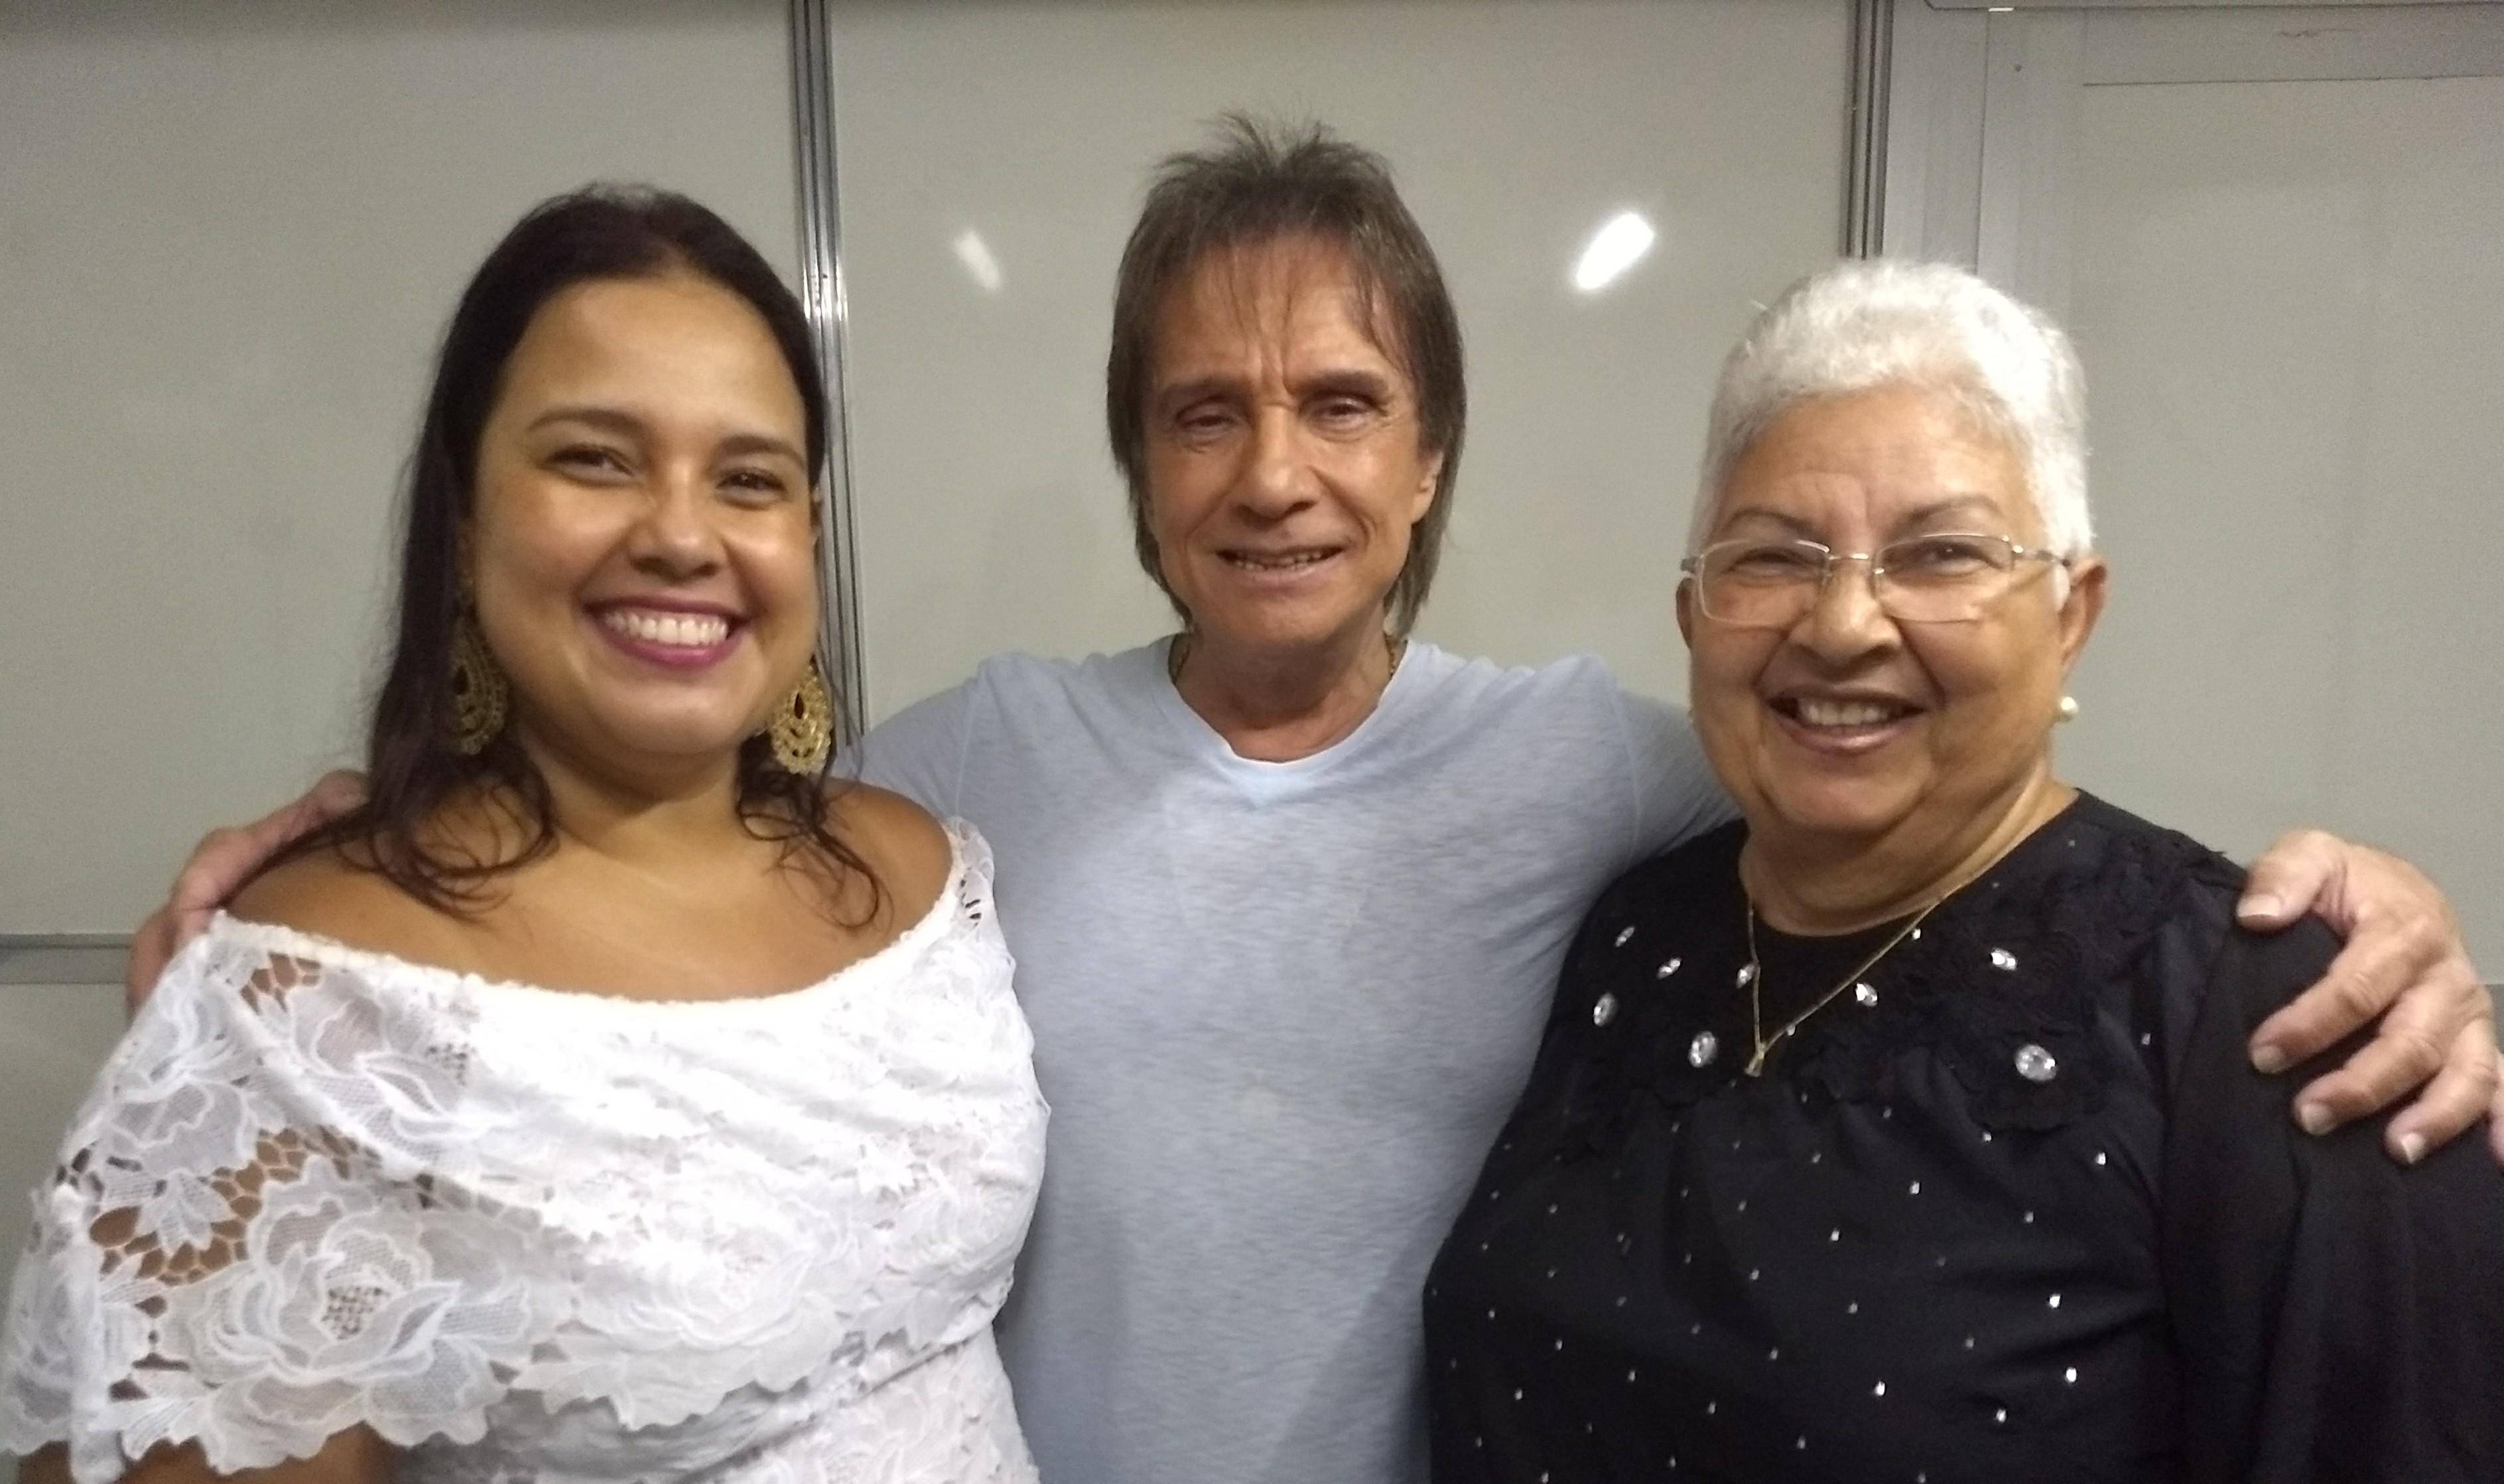 Débora e Carmem Bittencourt Soares da Silva